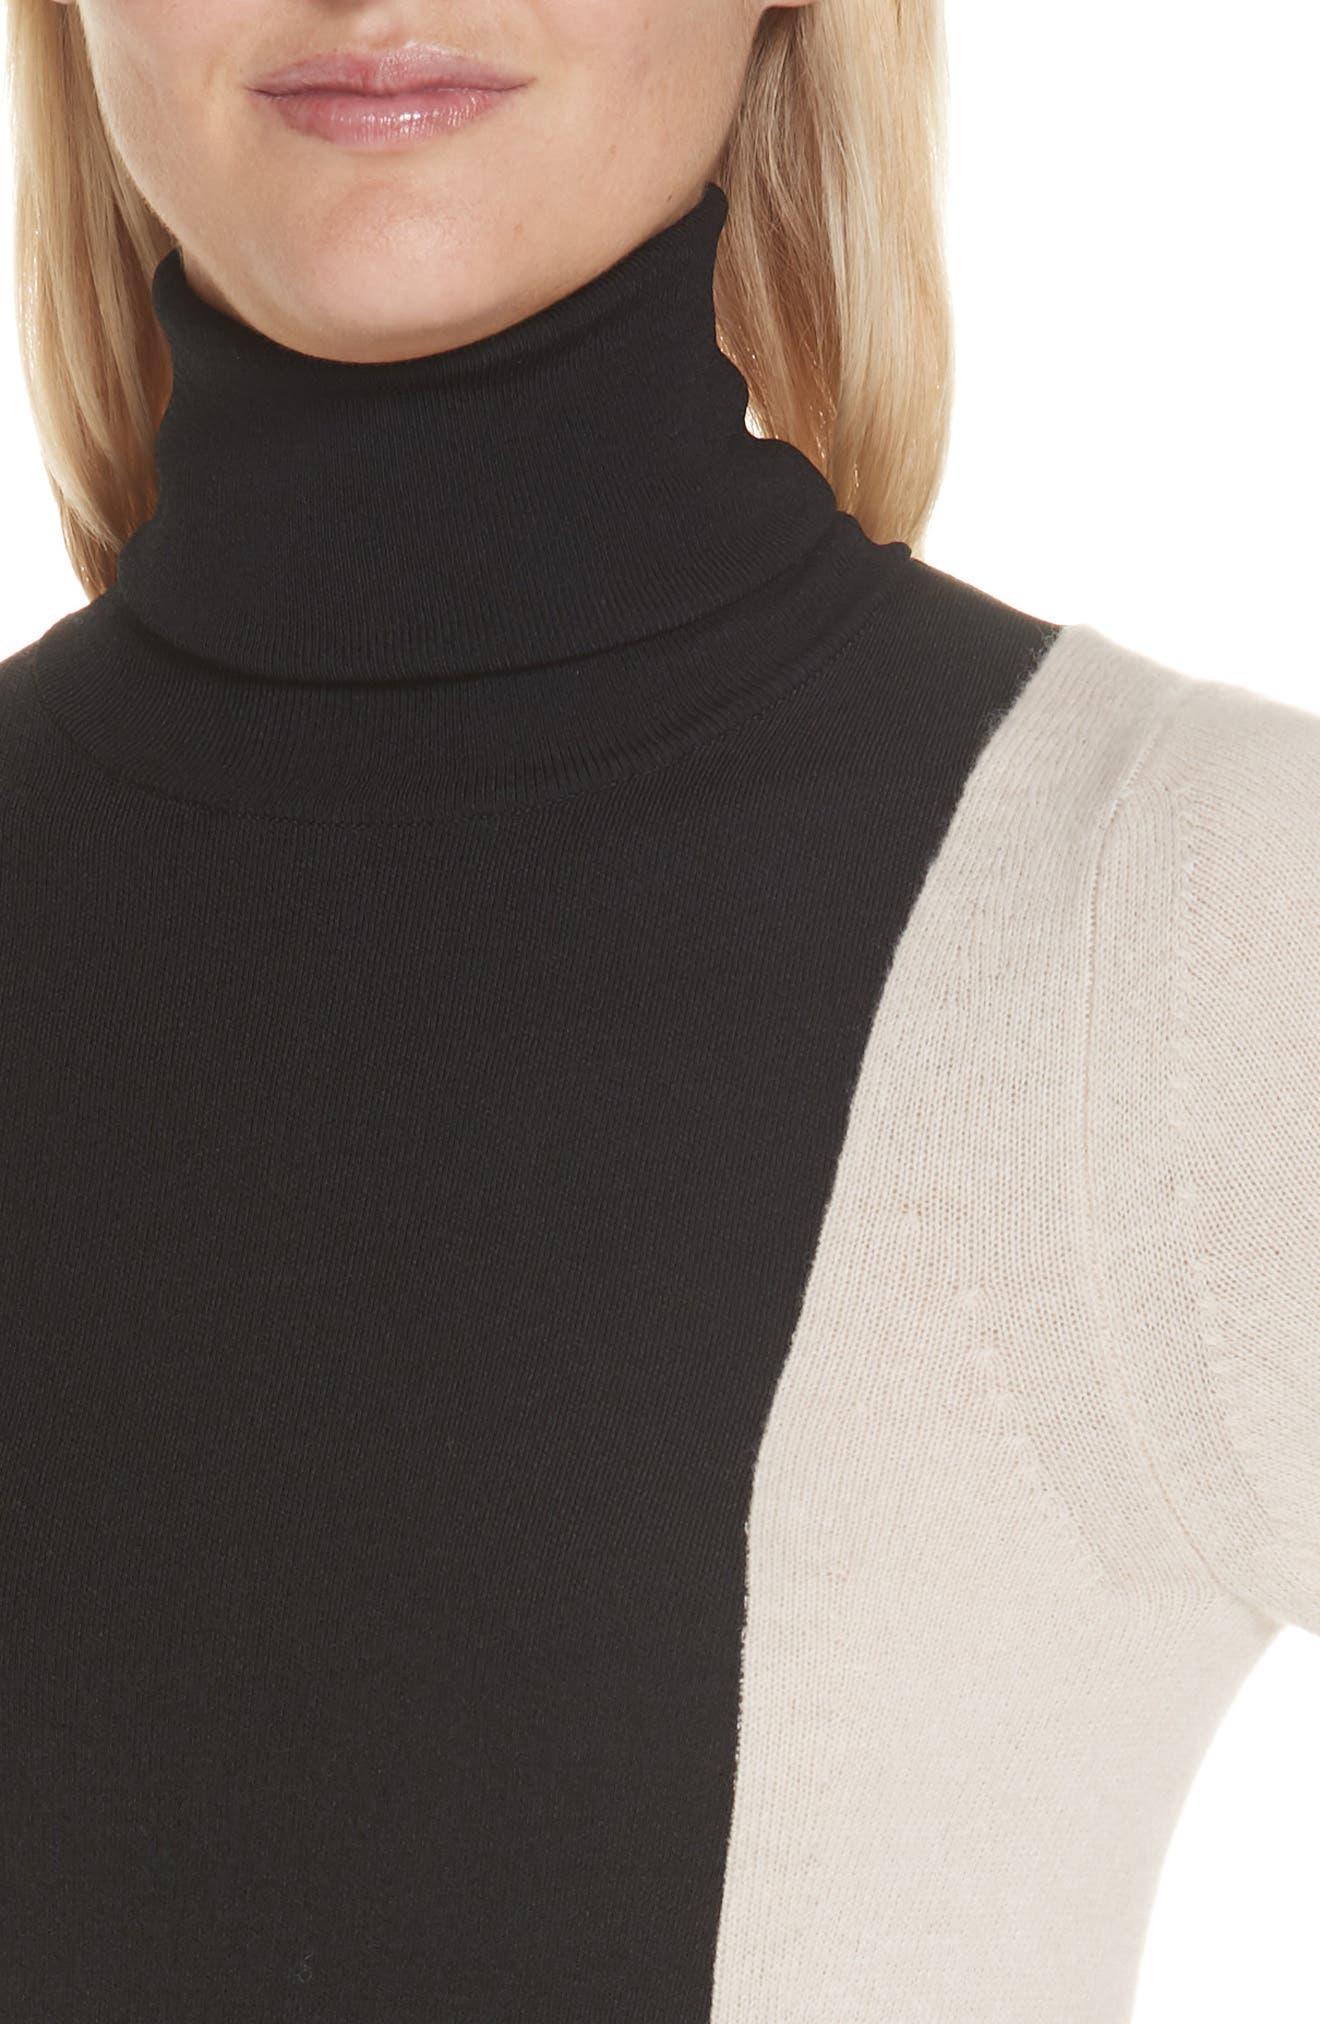 Colorblock Wool Blend Turtleneck Sweater,                             Alternate thumbnail 4, color,                             BLACK/ NUT